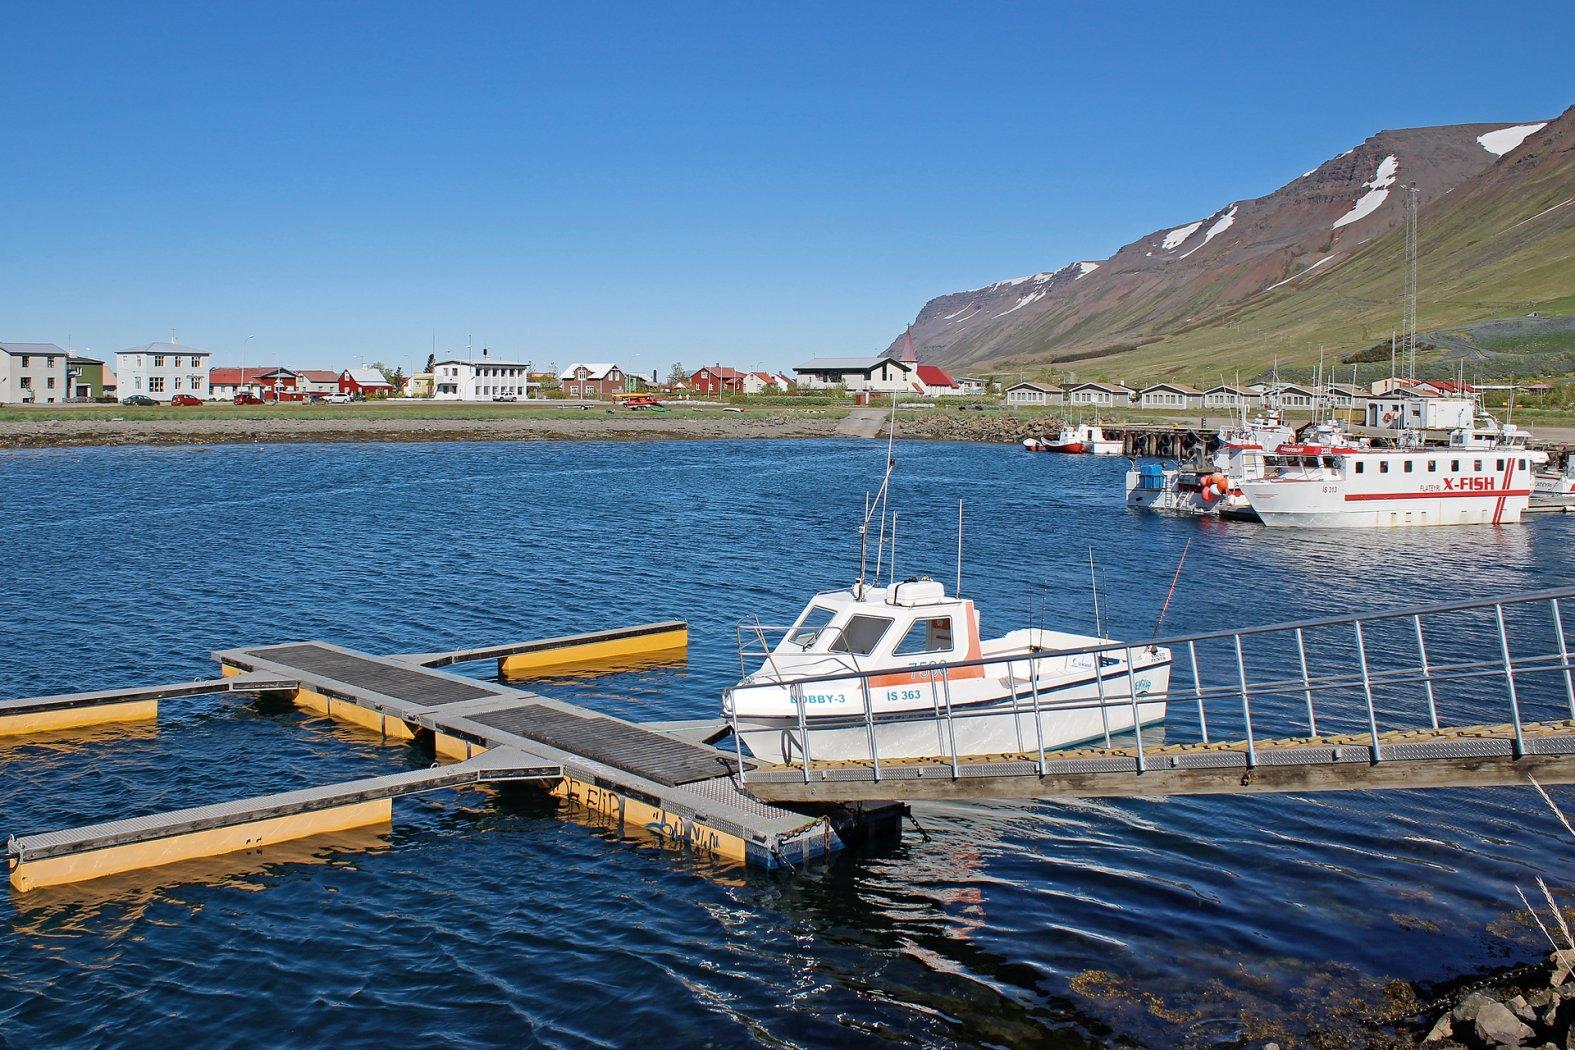 Angelurlaub in Island